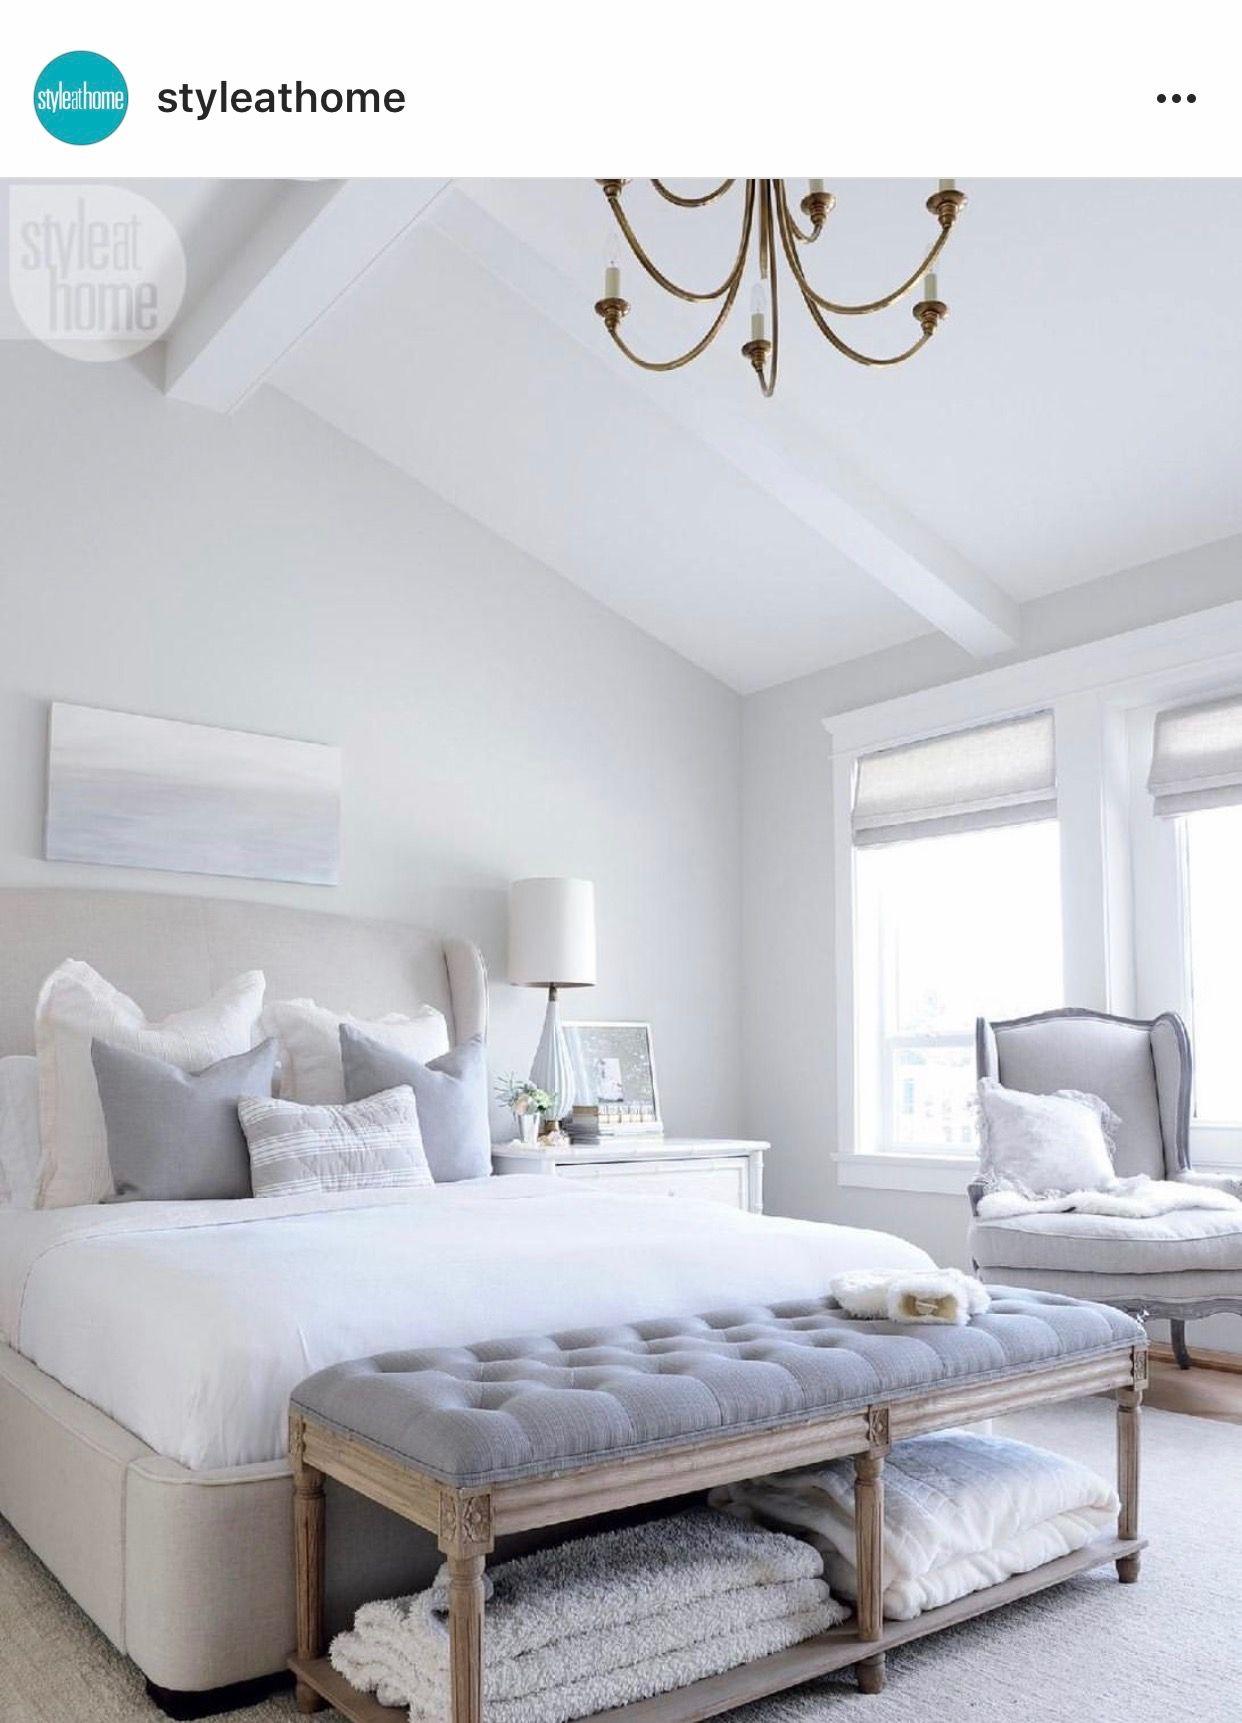 Color scheme, layout   Home decor ideas   Pinterest   Dormitorio ...